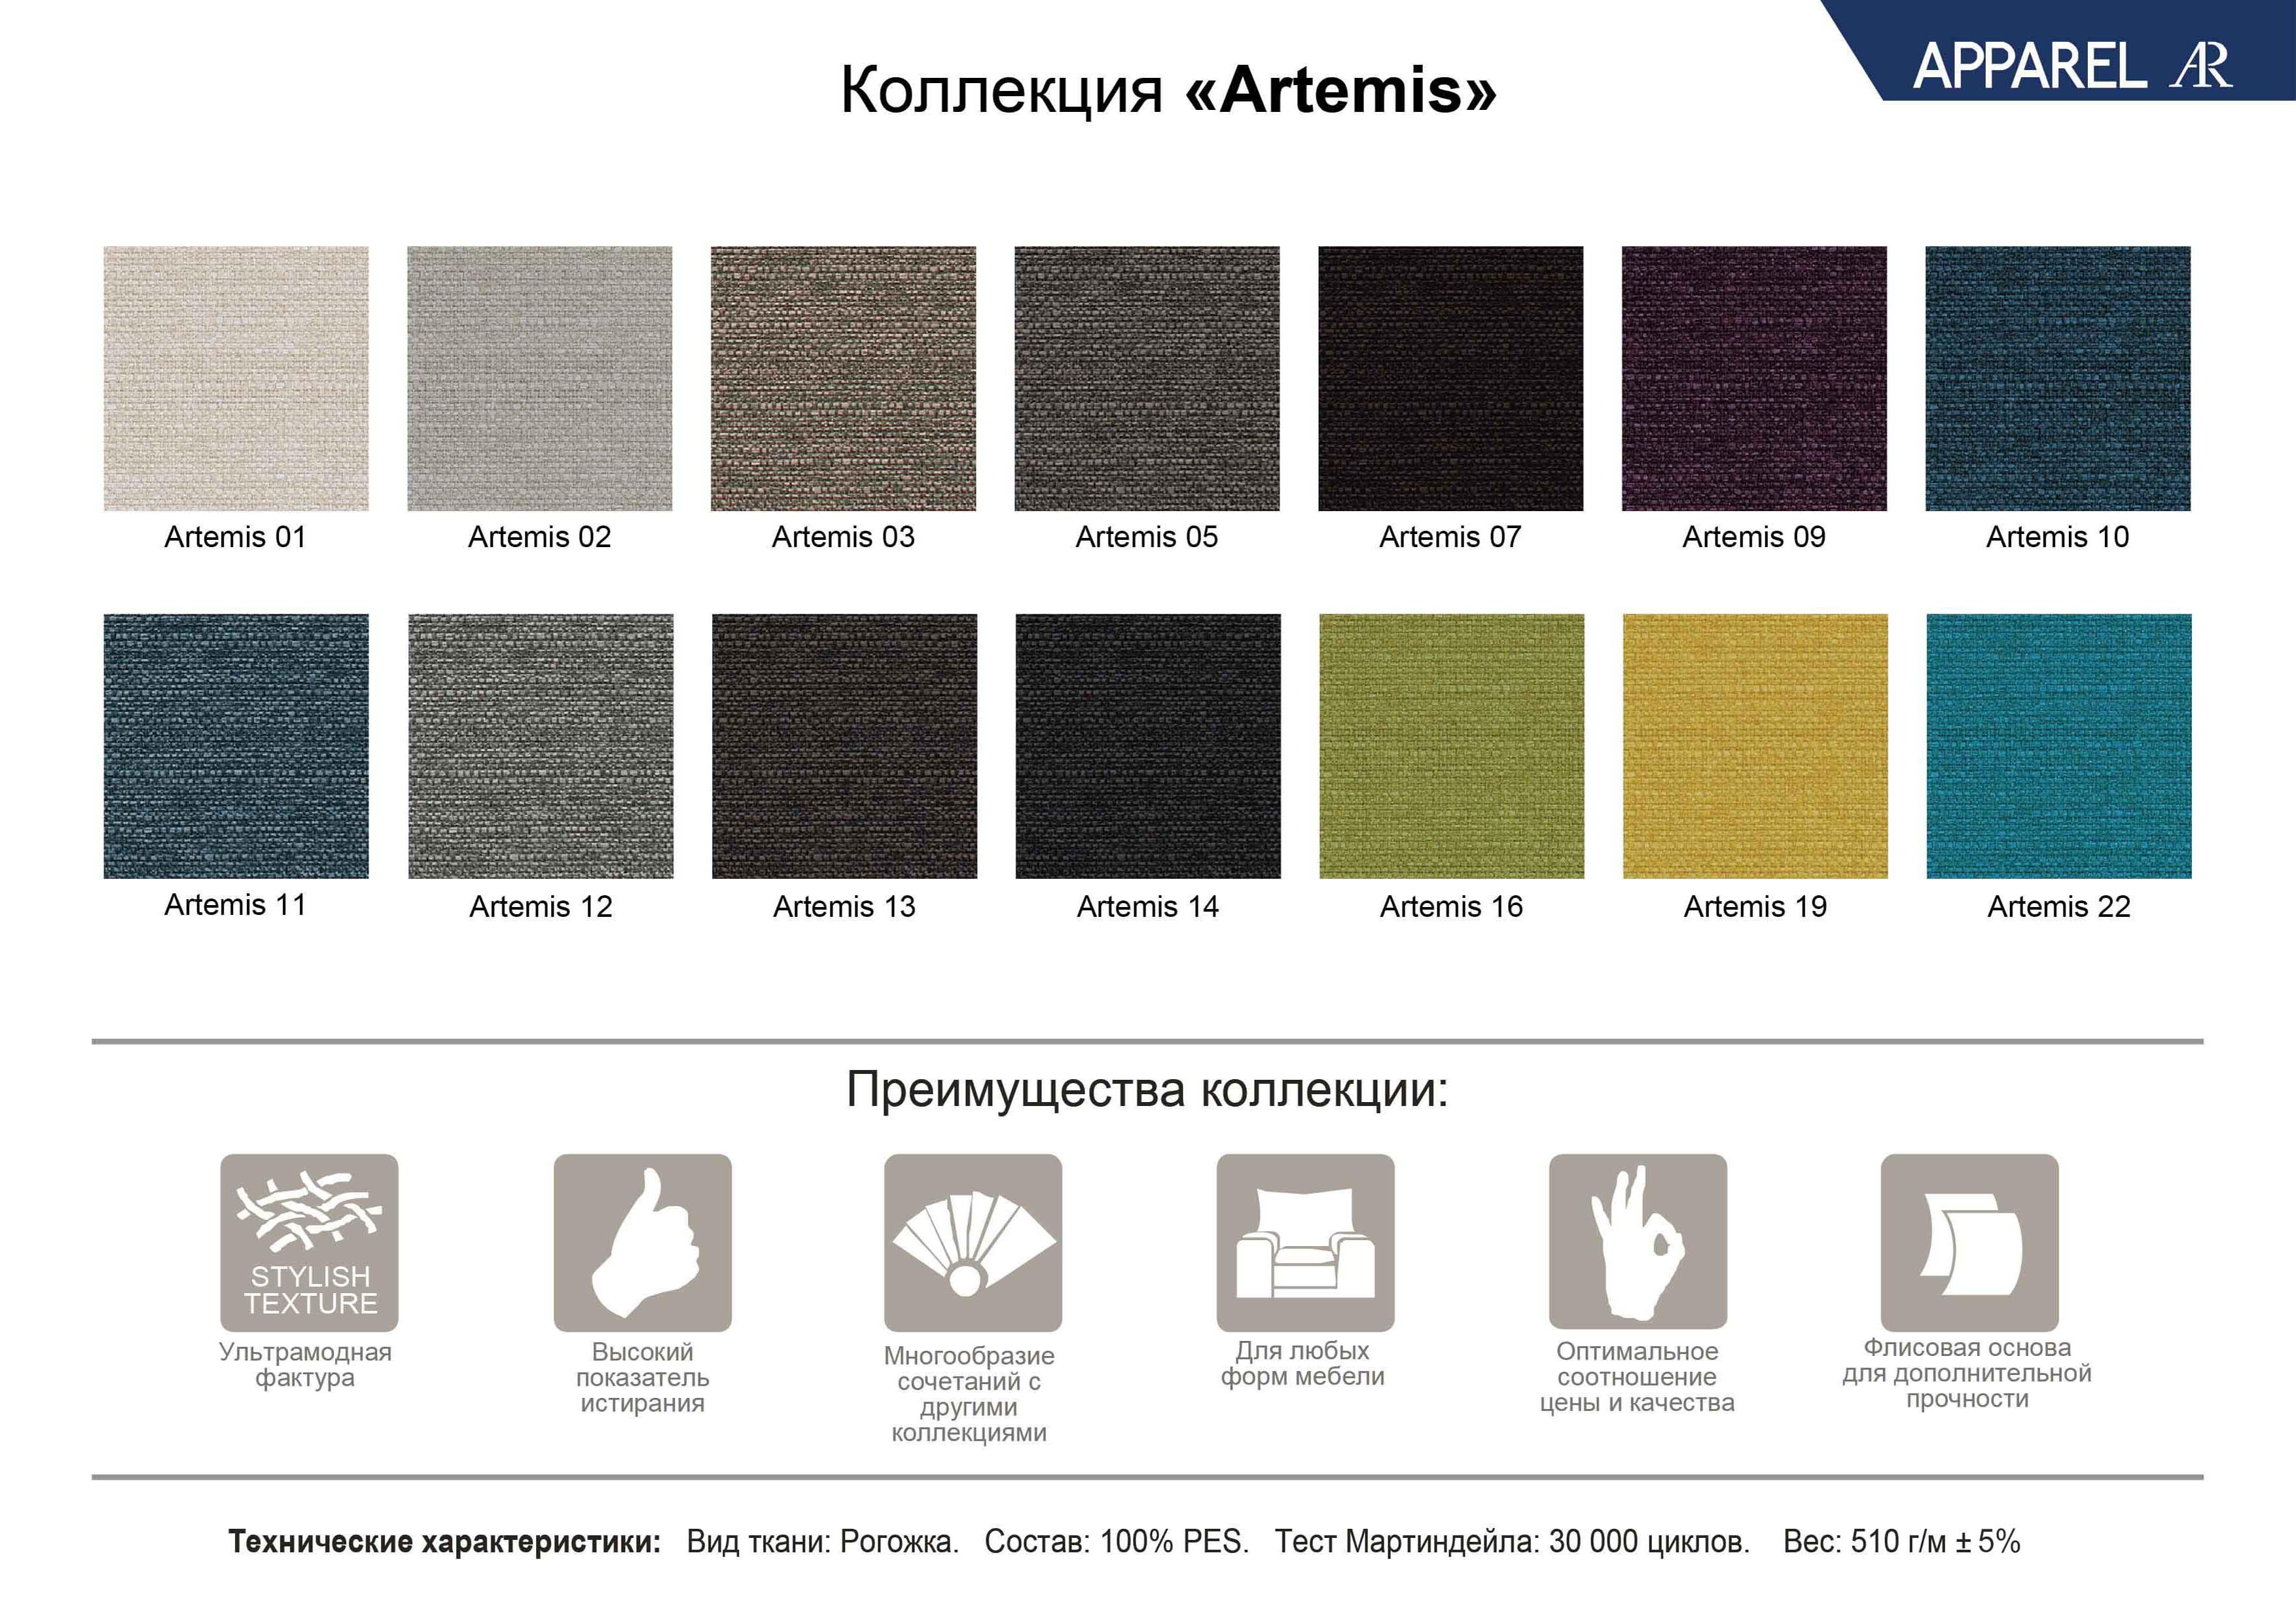 Картинки по запросу apparel artemis